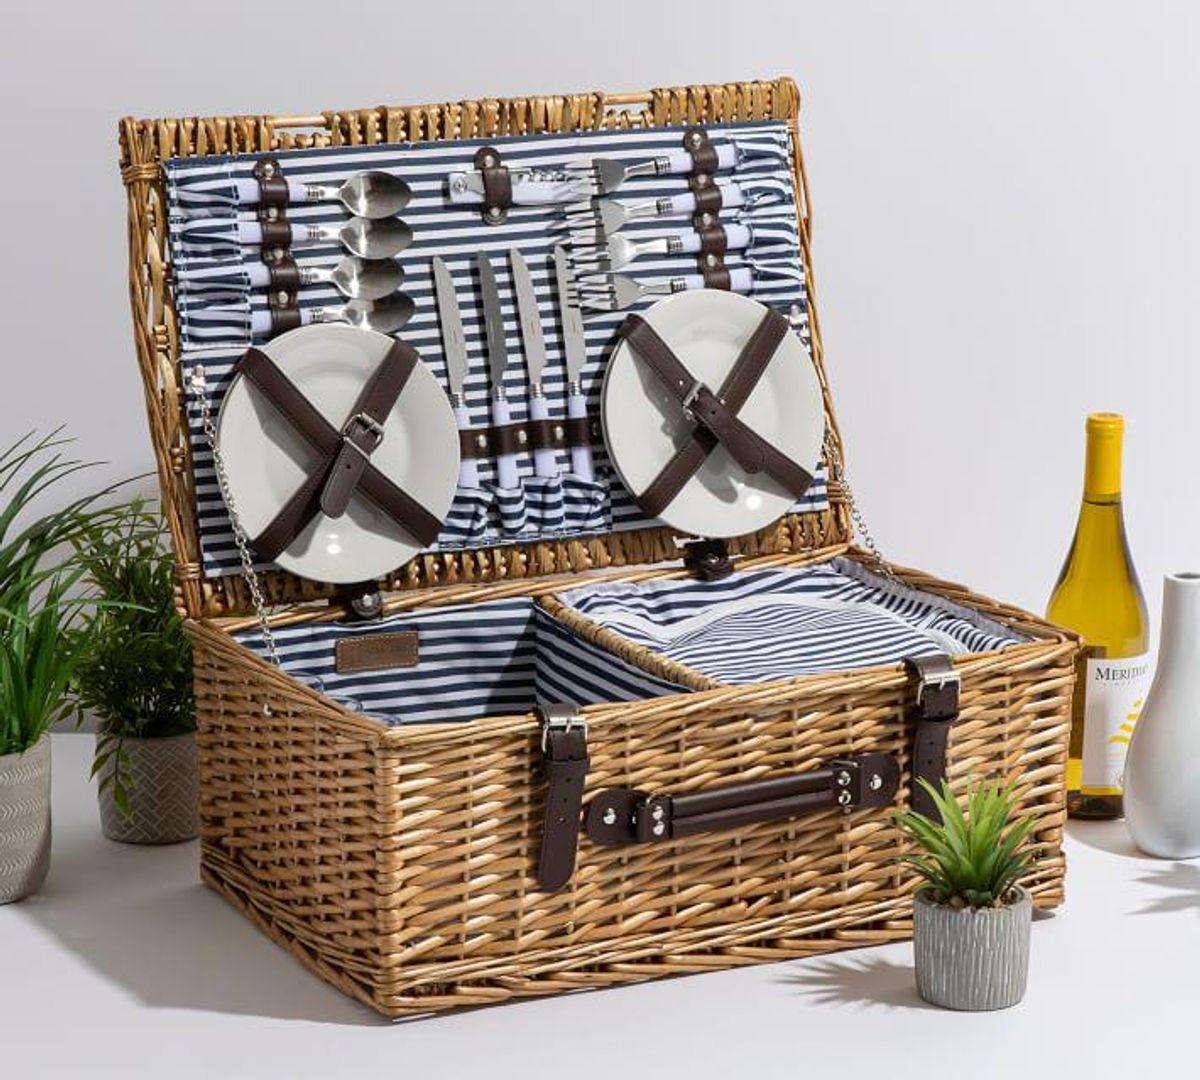 pottery barn providence woven picnic baskets